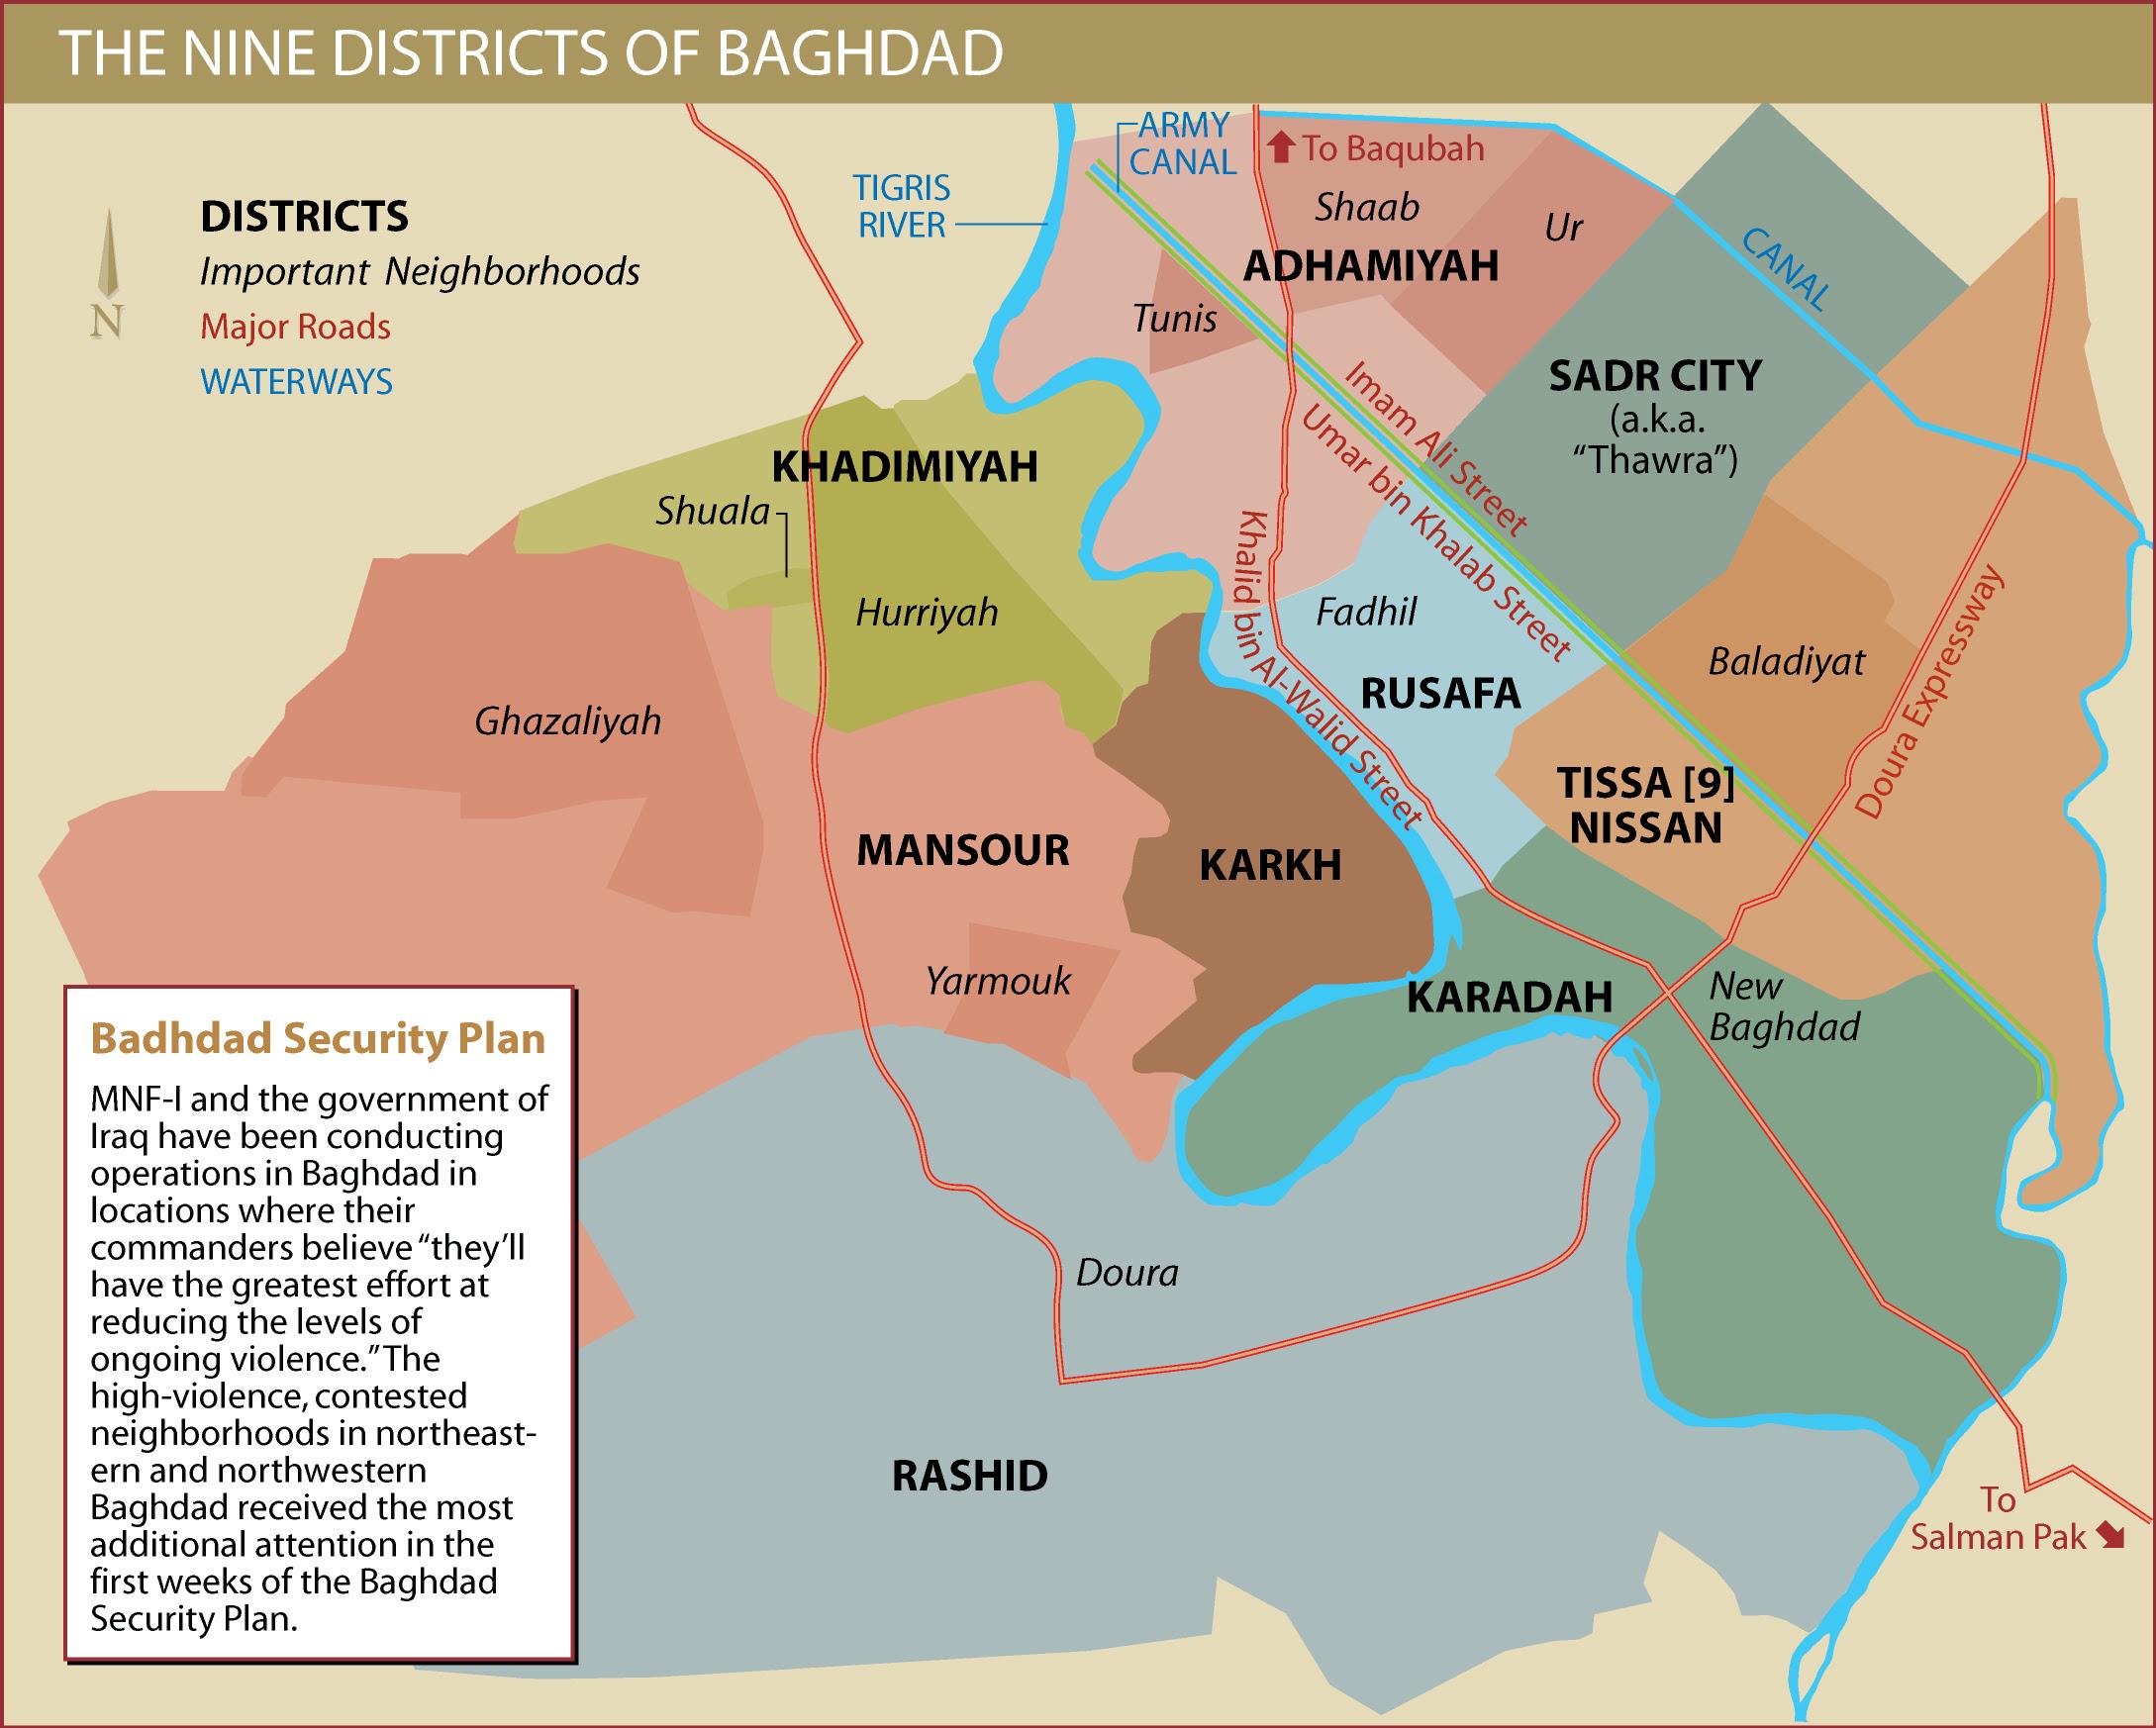 BaghdadDistricts